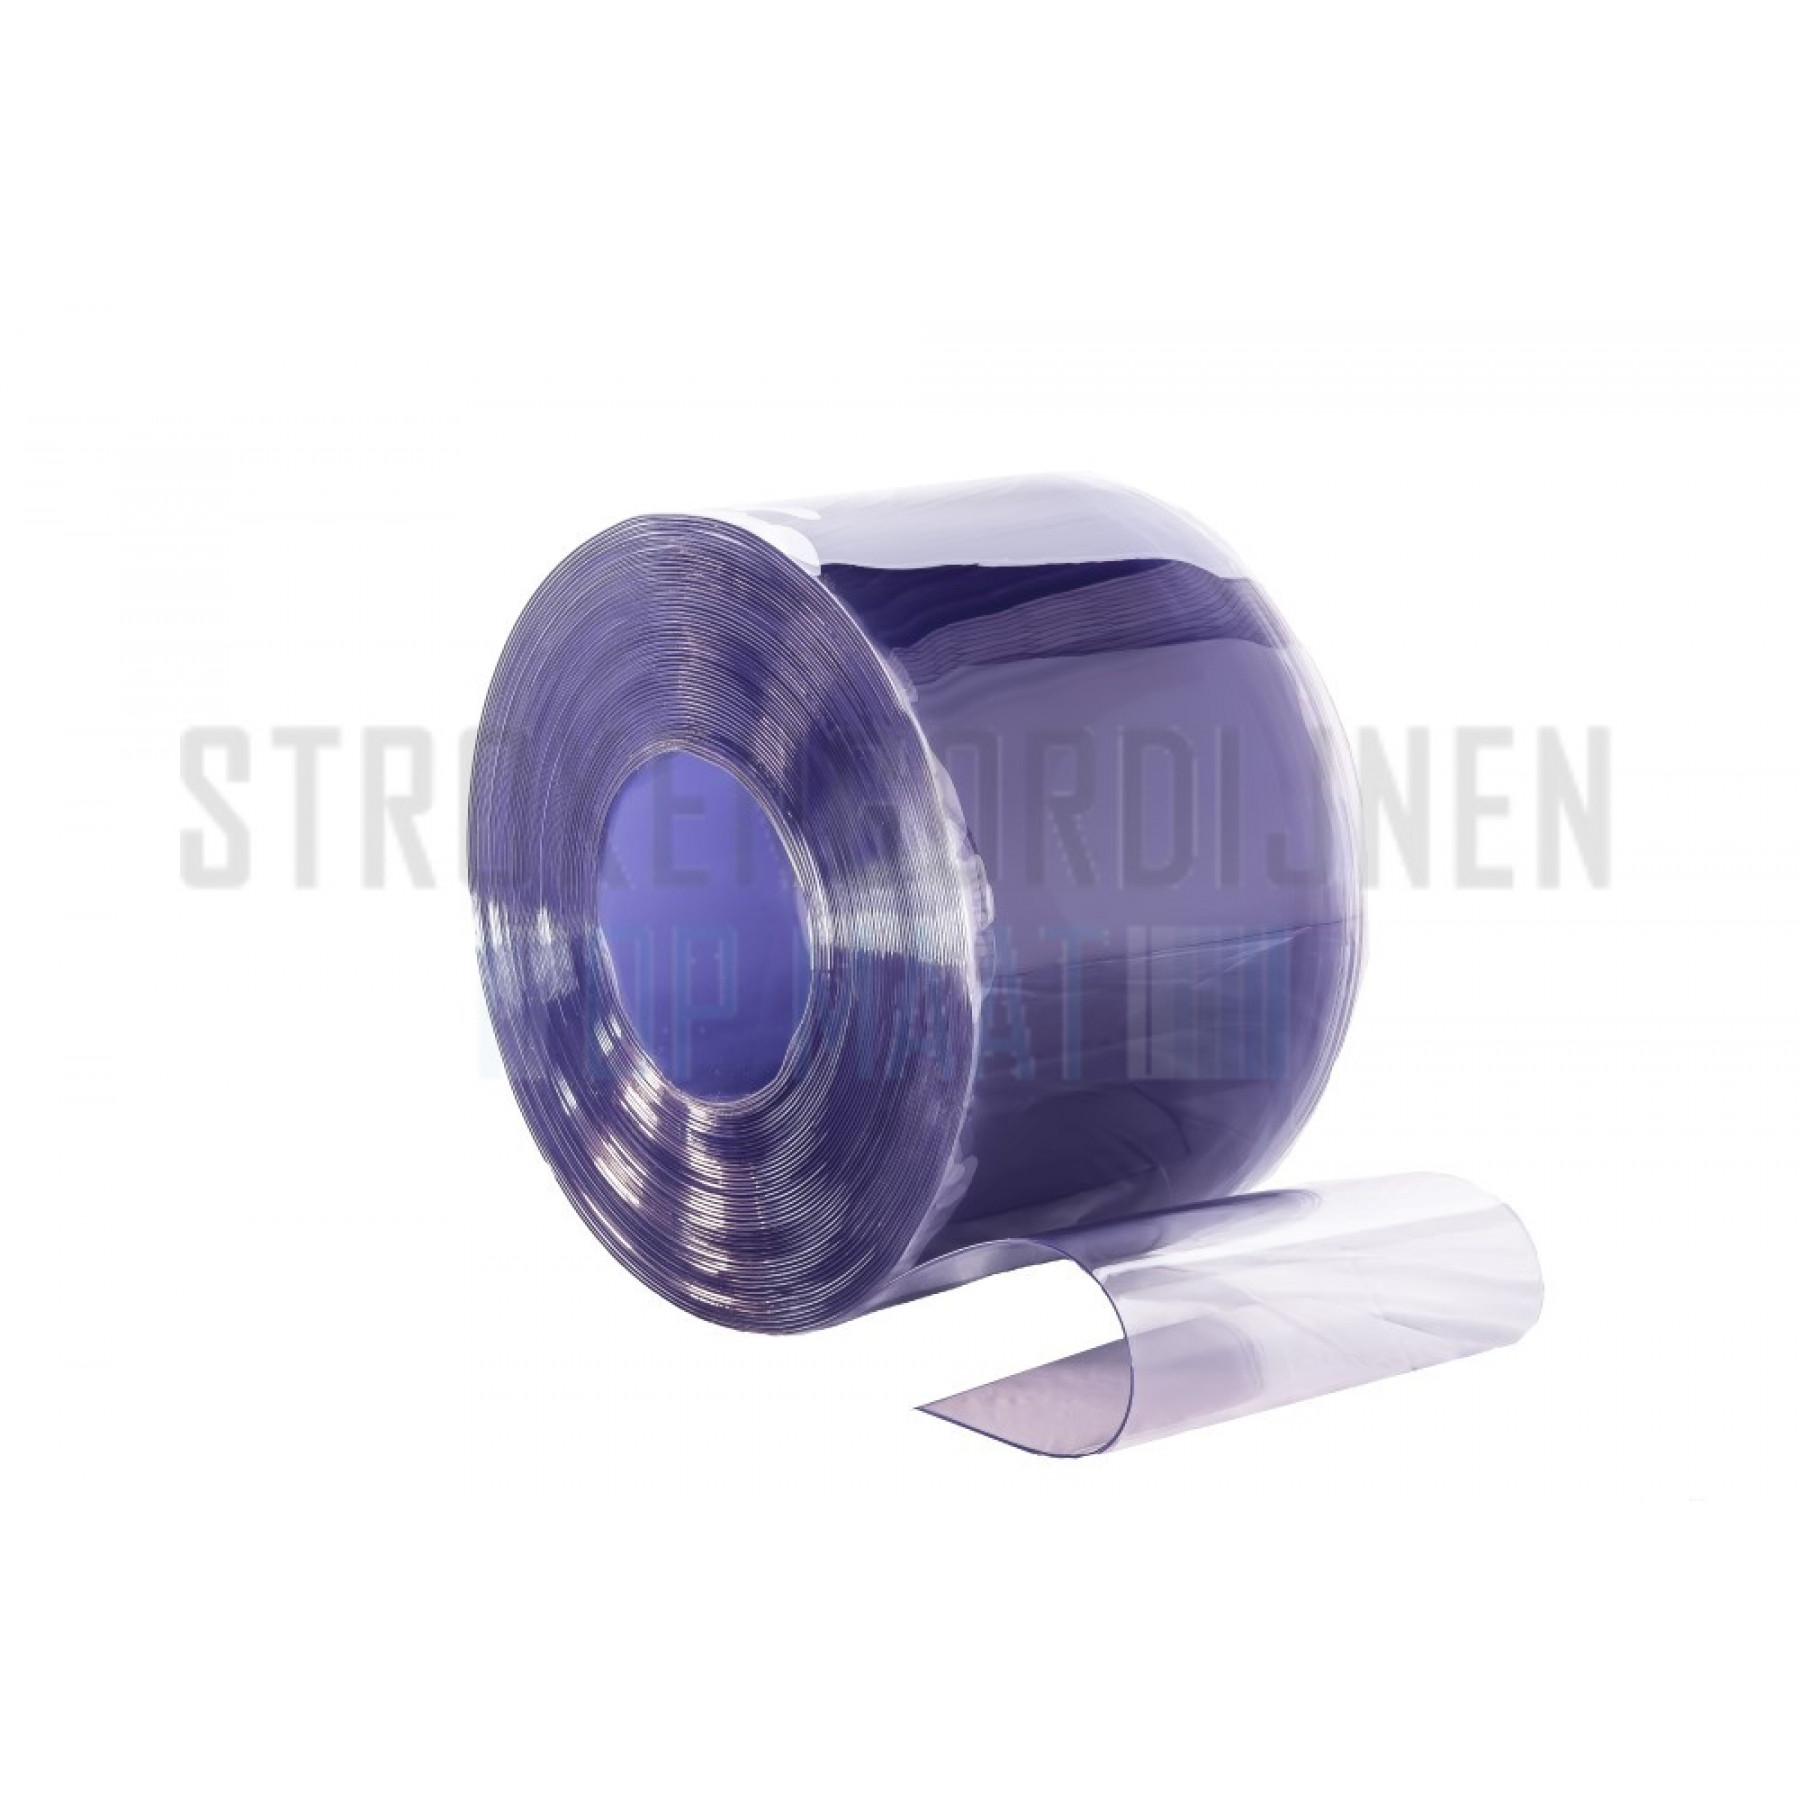 PVC stroken op maat, anti-statisch, 200mm breed, 2mm dik, transparant